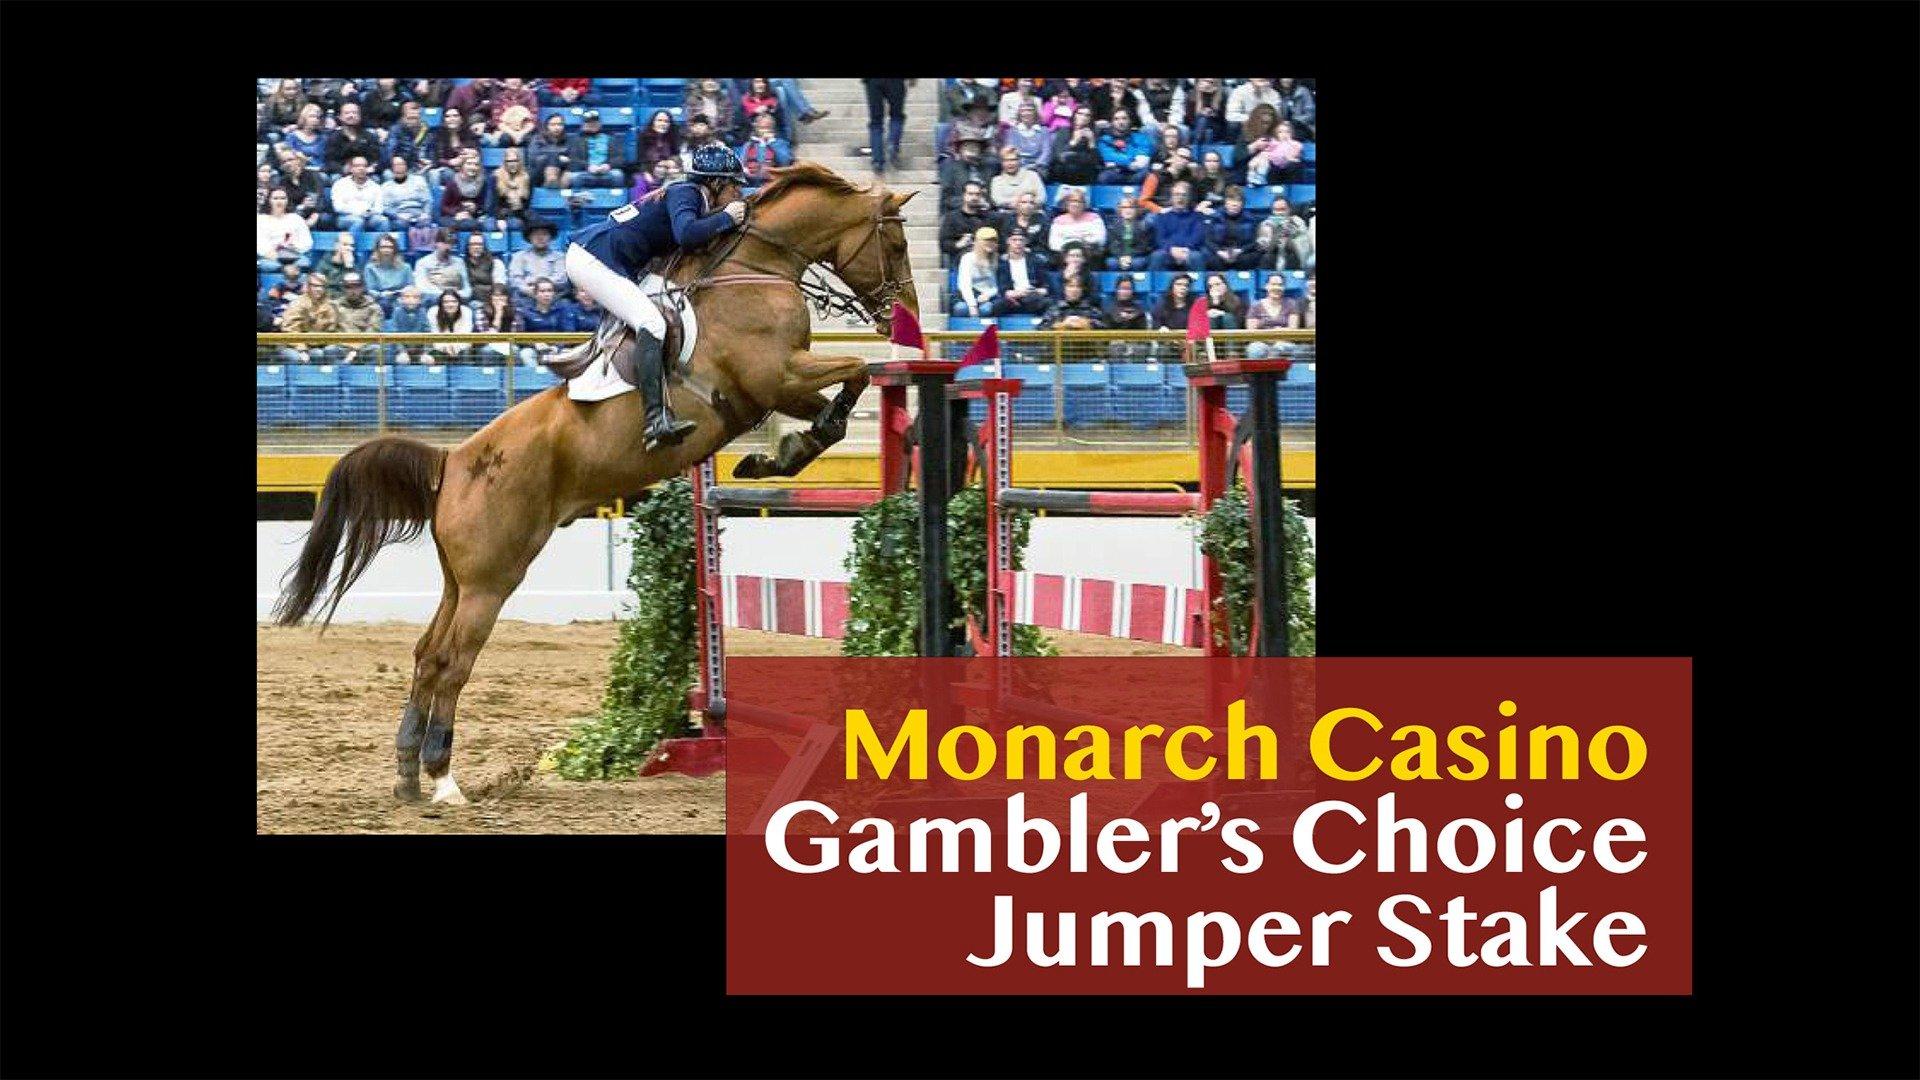 Monarch Casino Gambler's Choice Jumper Stake